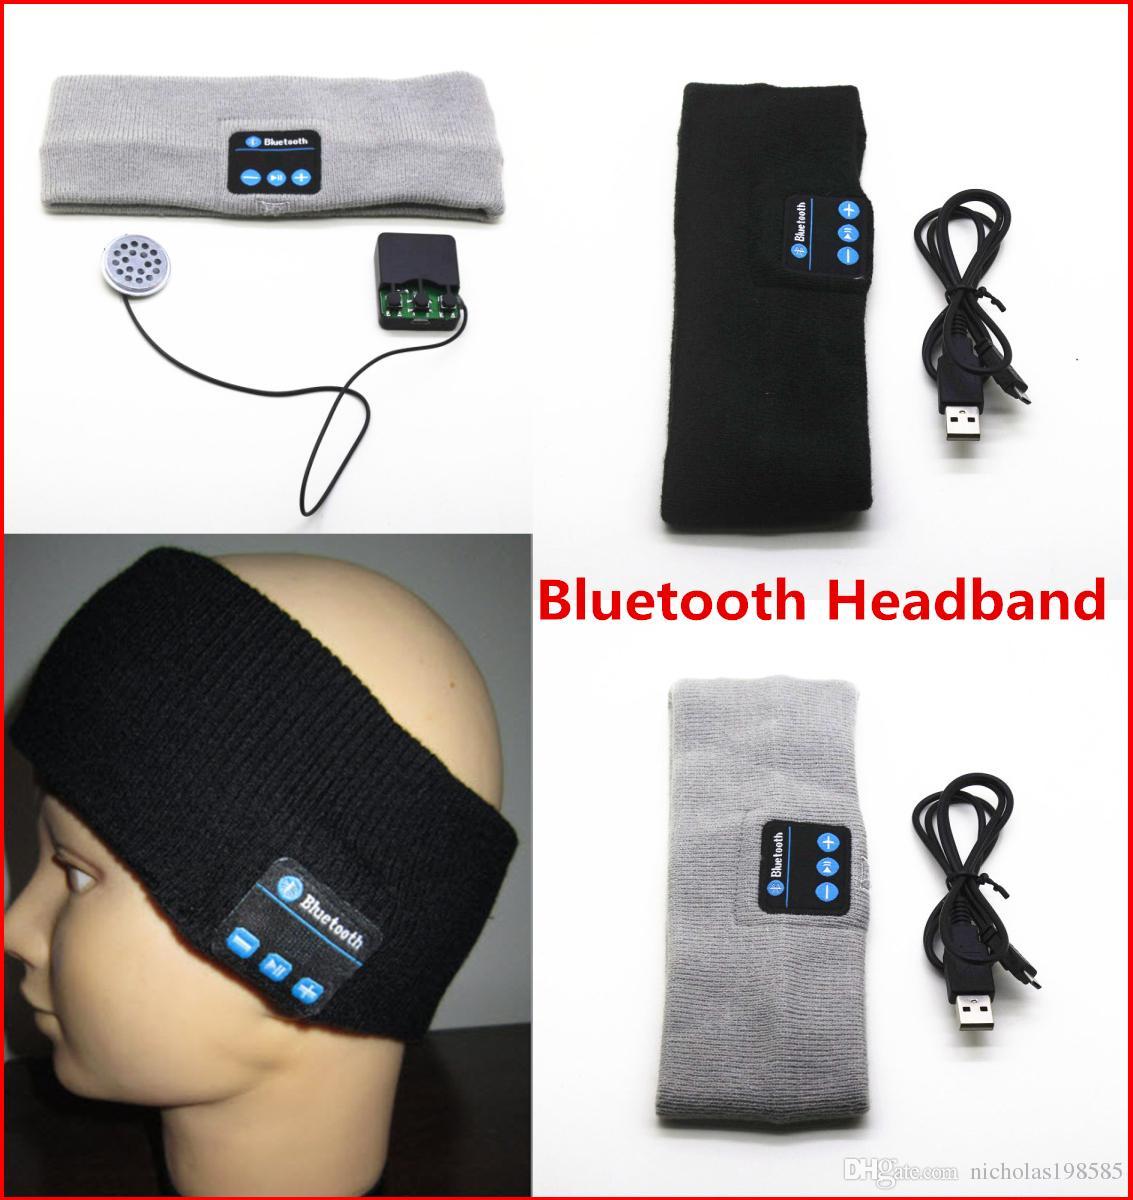 Gym headphones wireless waterproof - wireless headband headphones